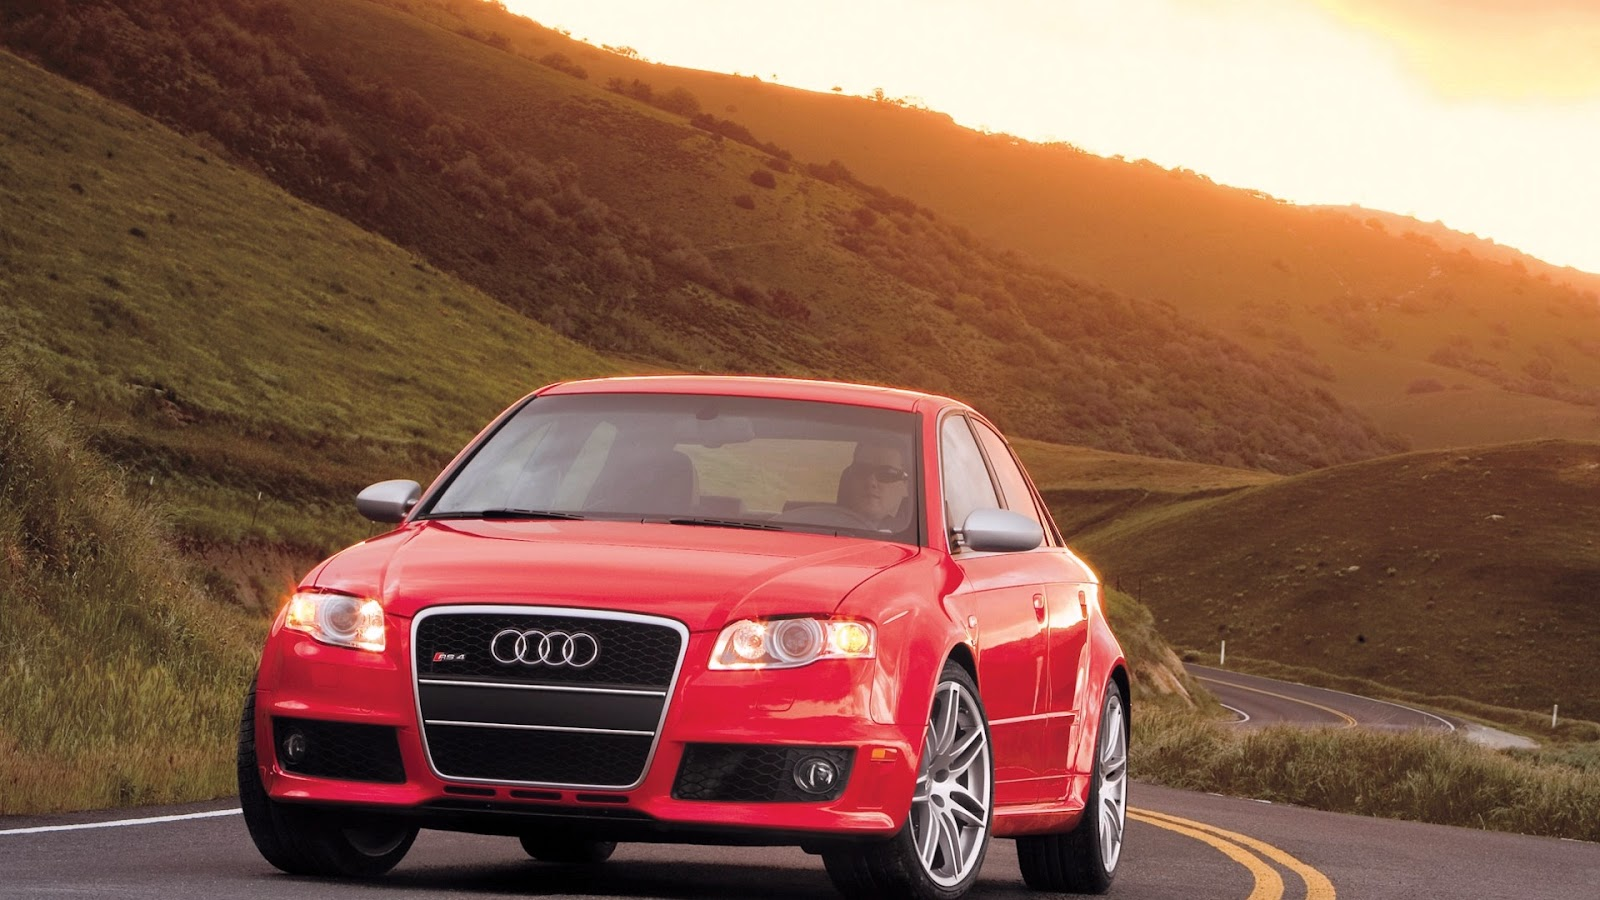 Audi A9 Wallpaper Hd